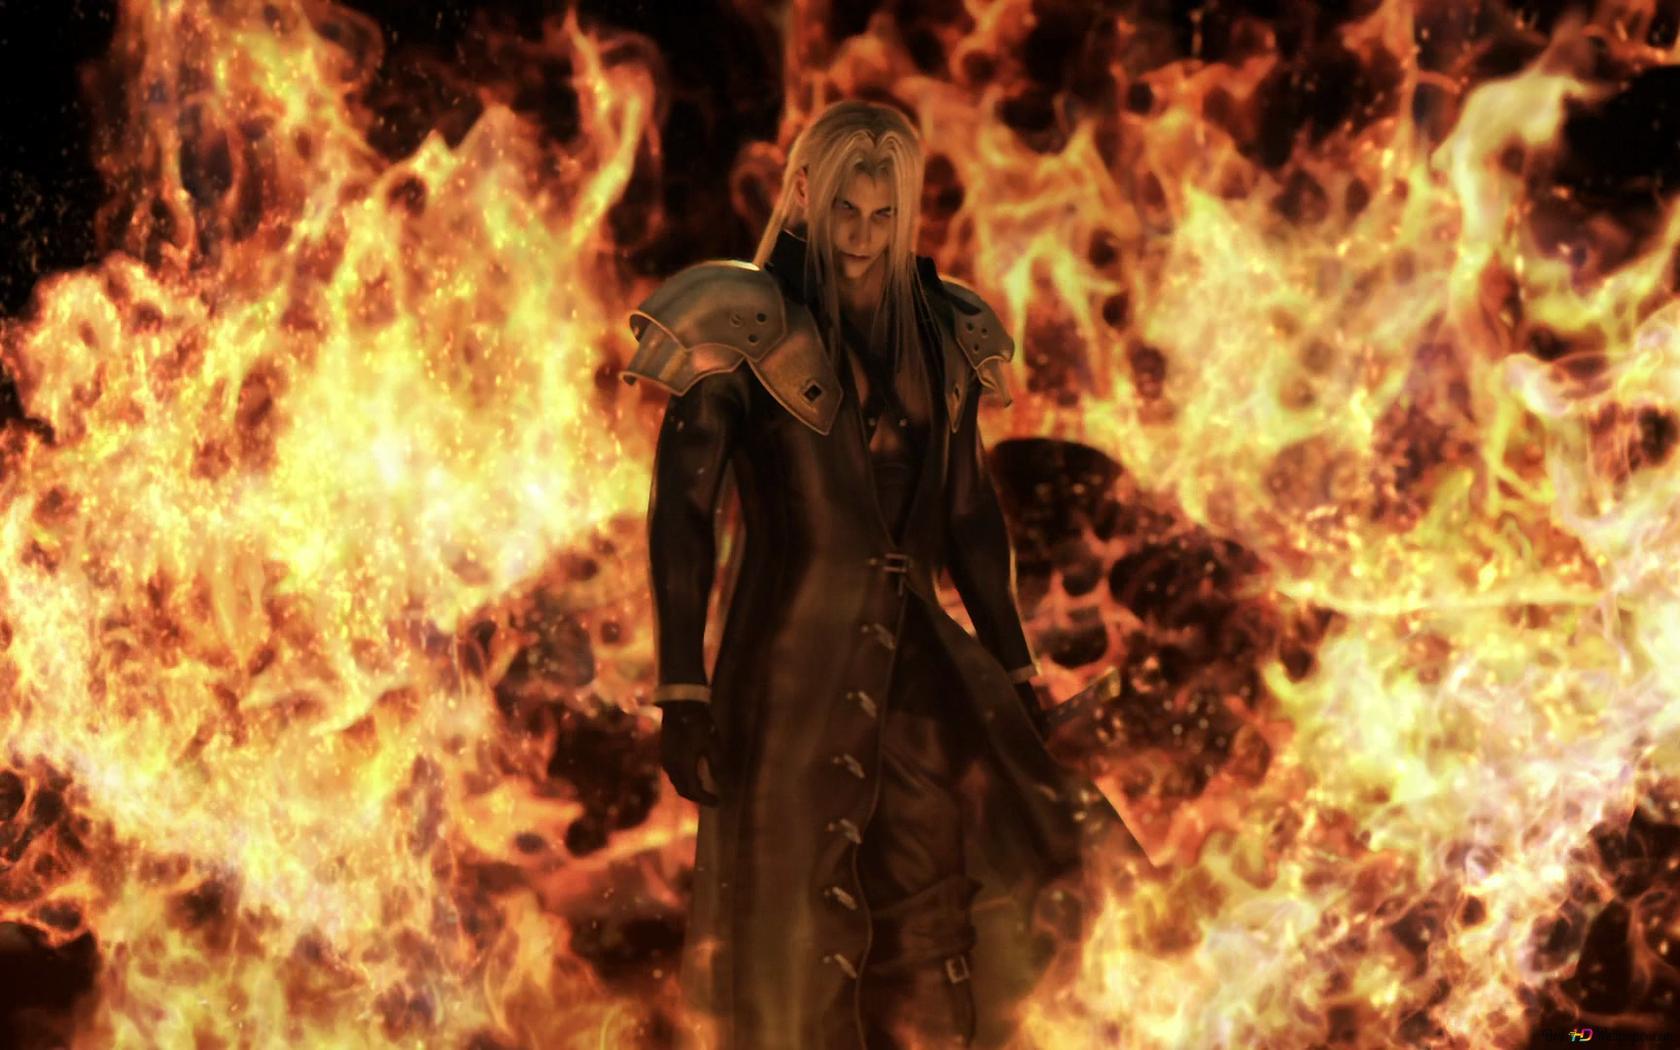 Final Fantasy Vii Advent Children Sephiroth Hd Wallpaper